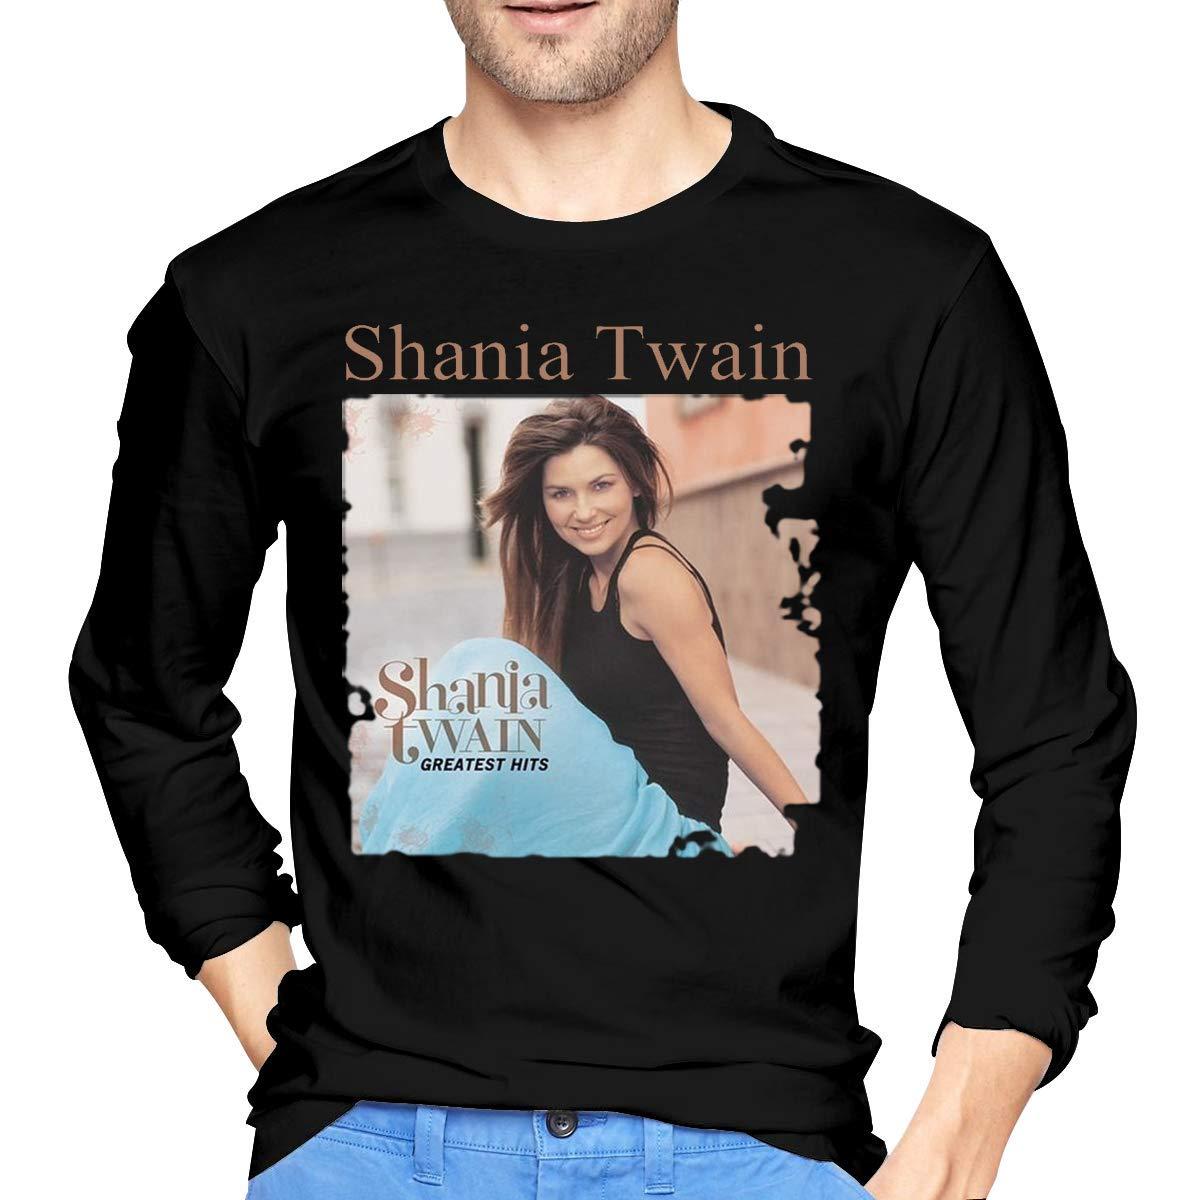 Fssatung S Shania Twain T Shirt Black